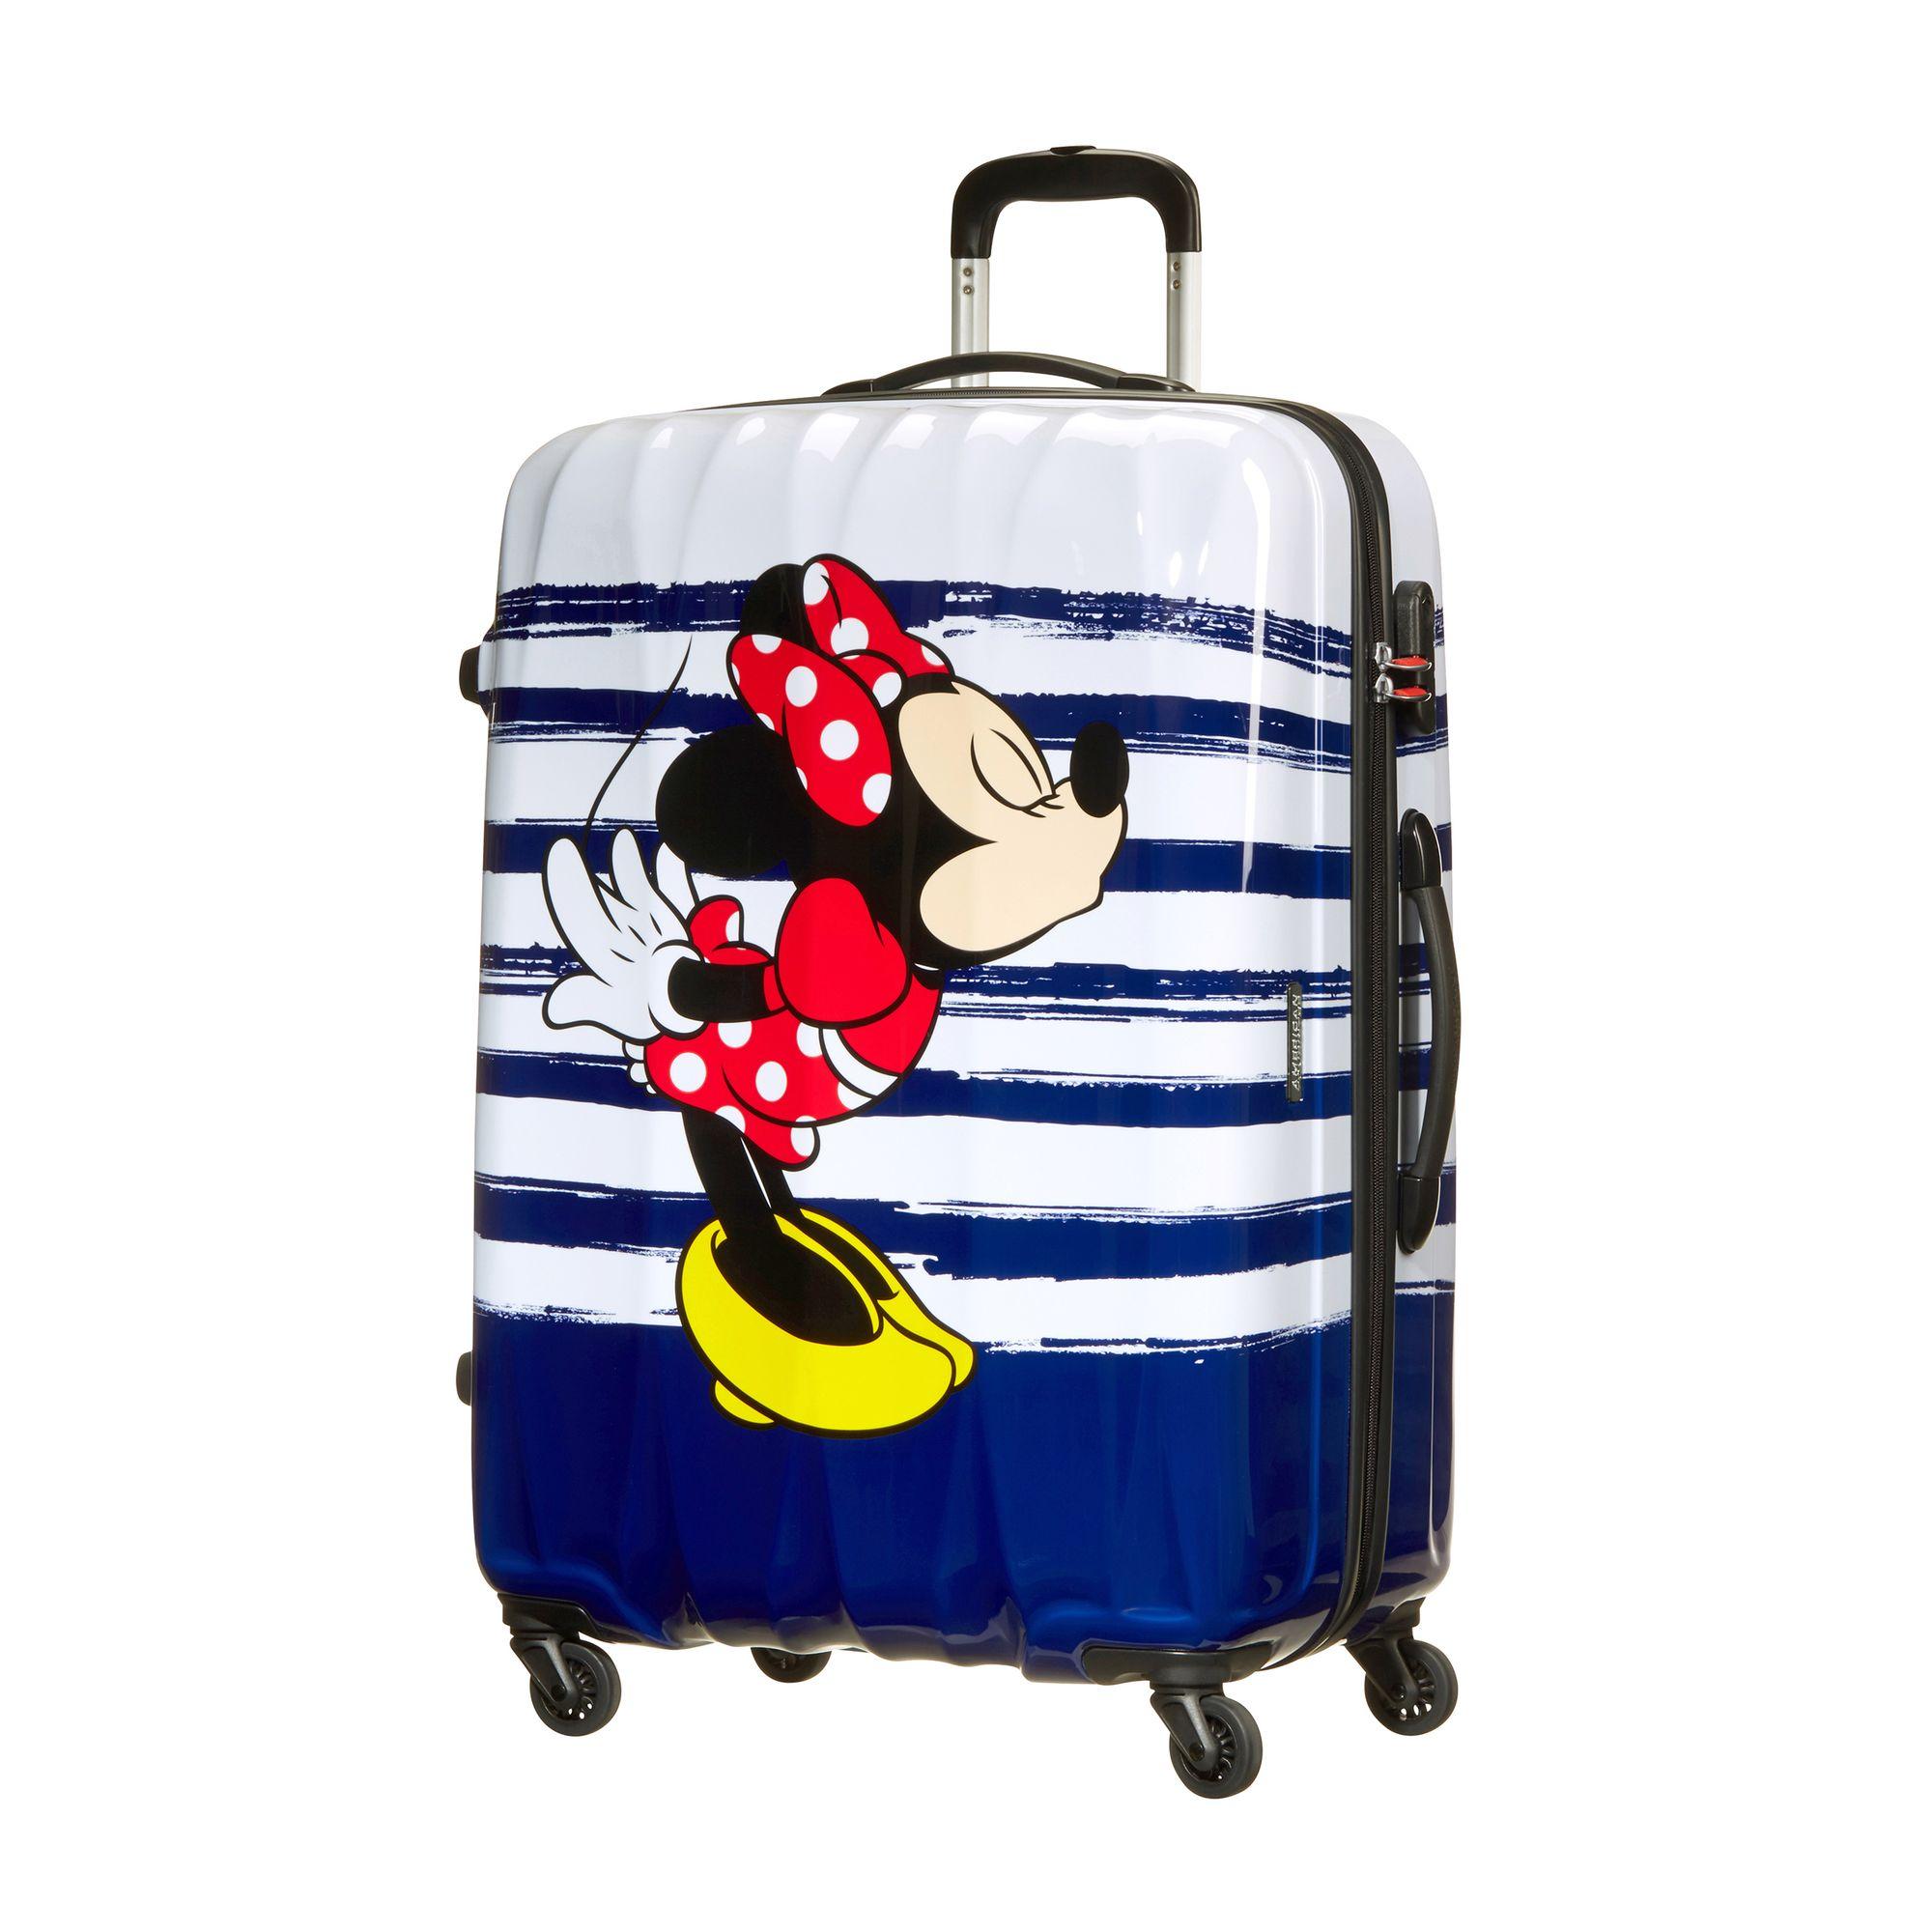 Bild på American Tourister Disney Legends Mimmi Pigg resväska 15aa729ef1278